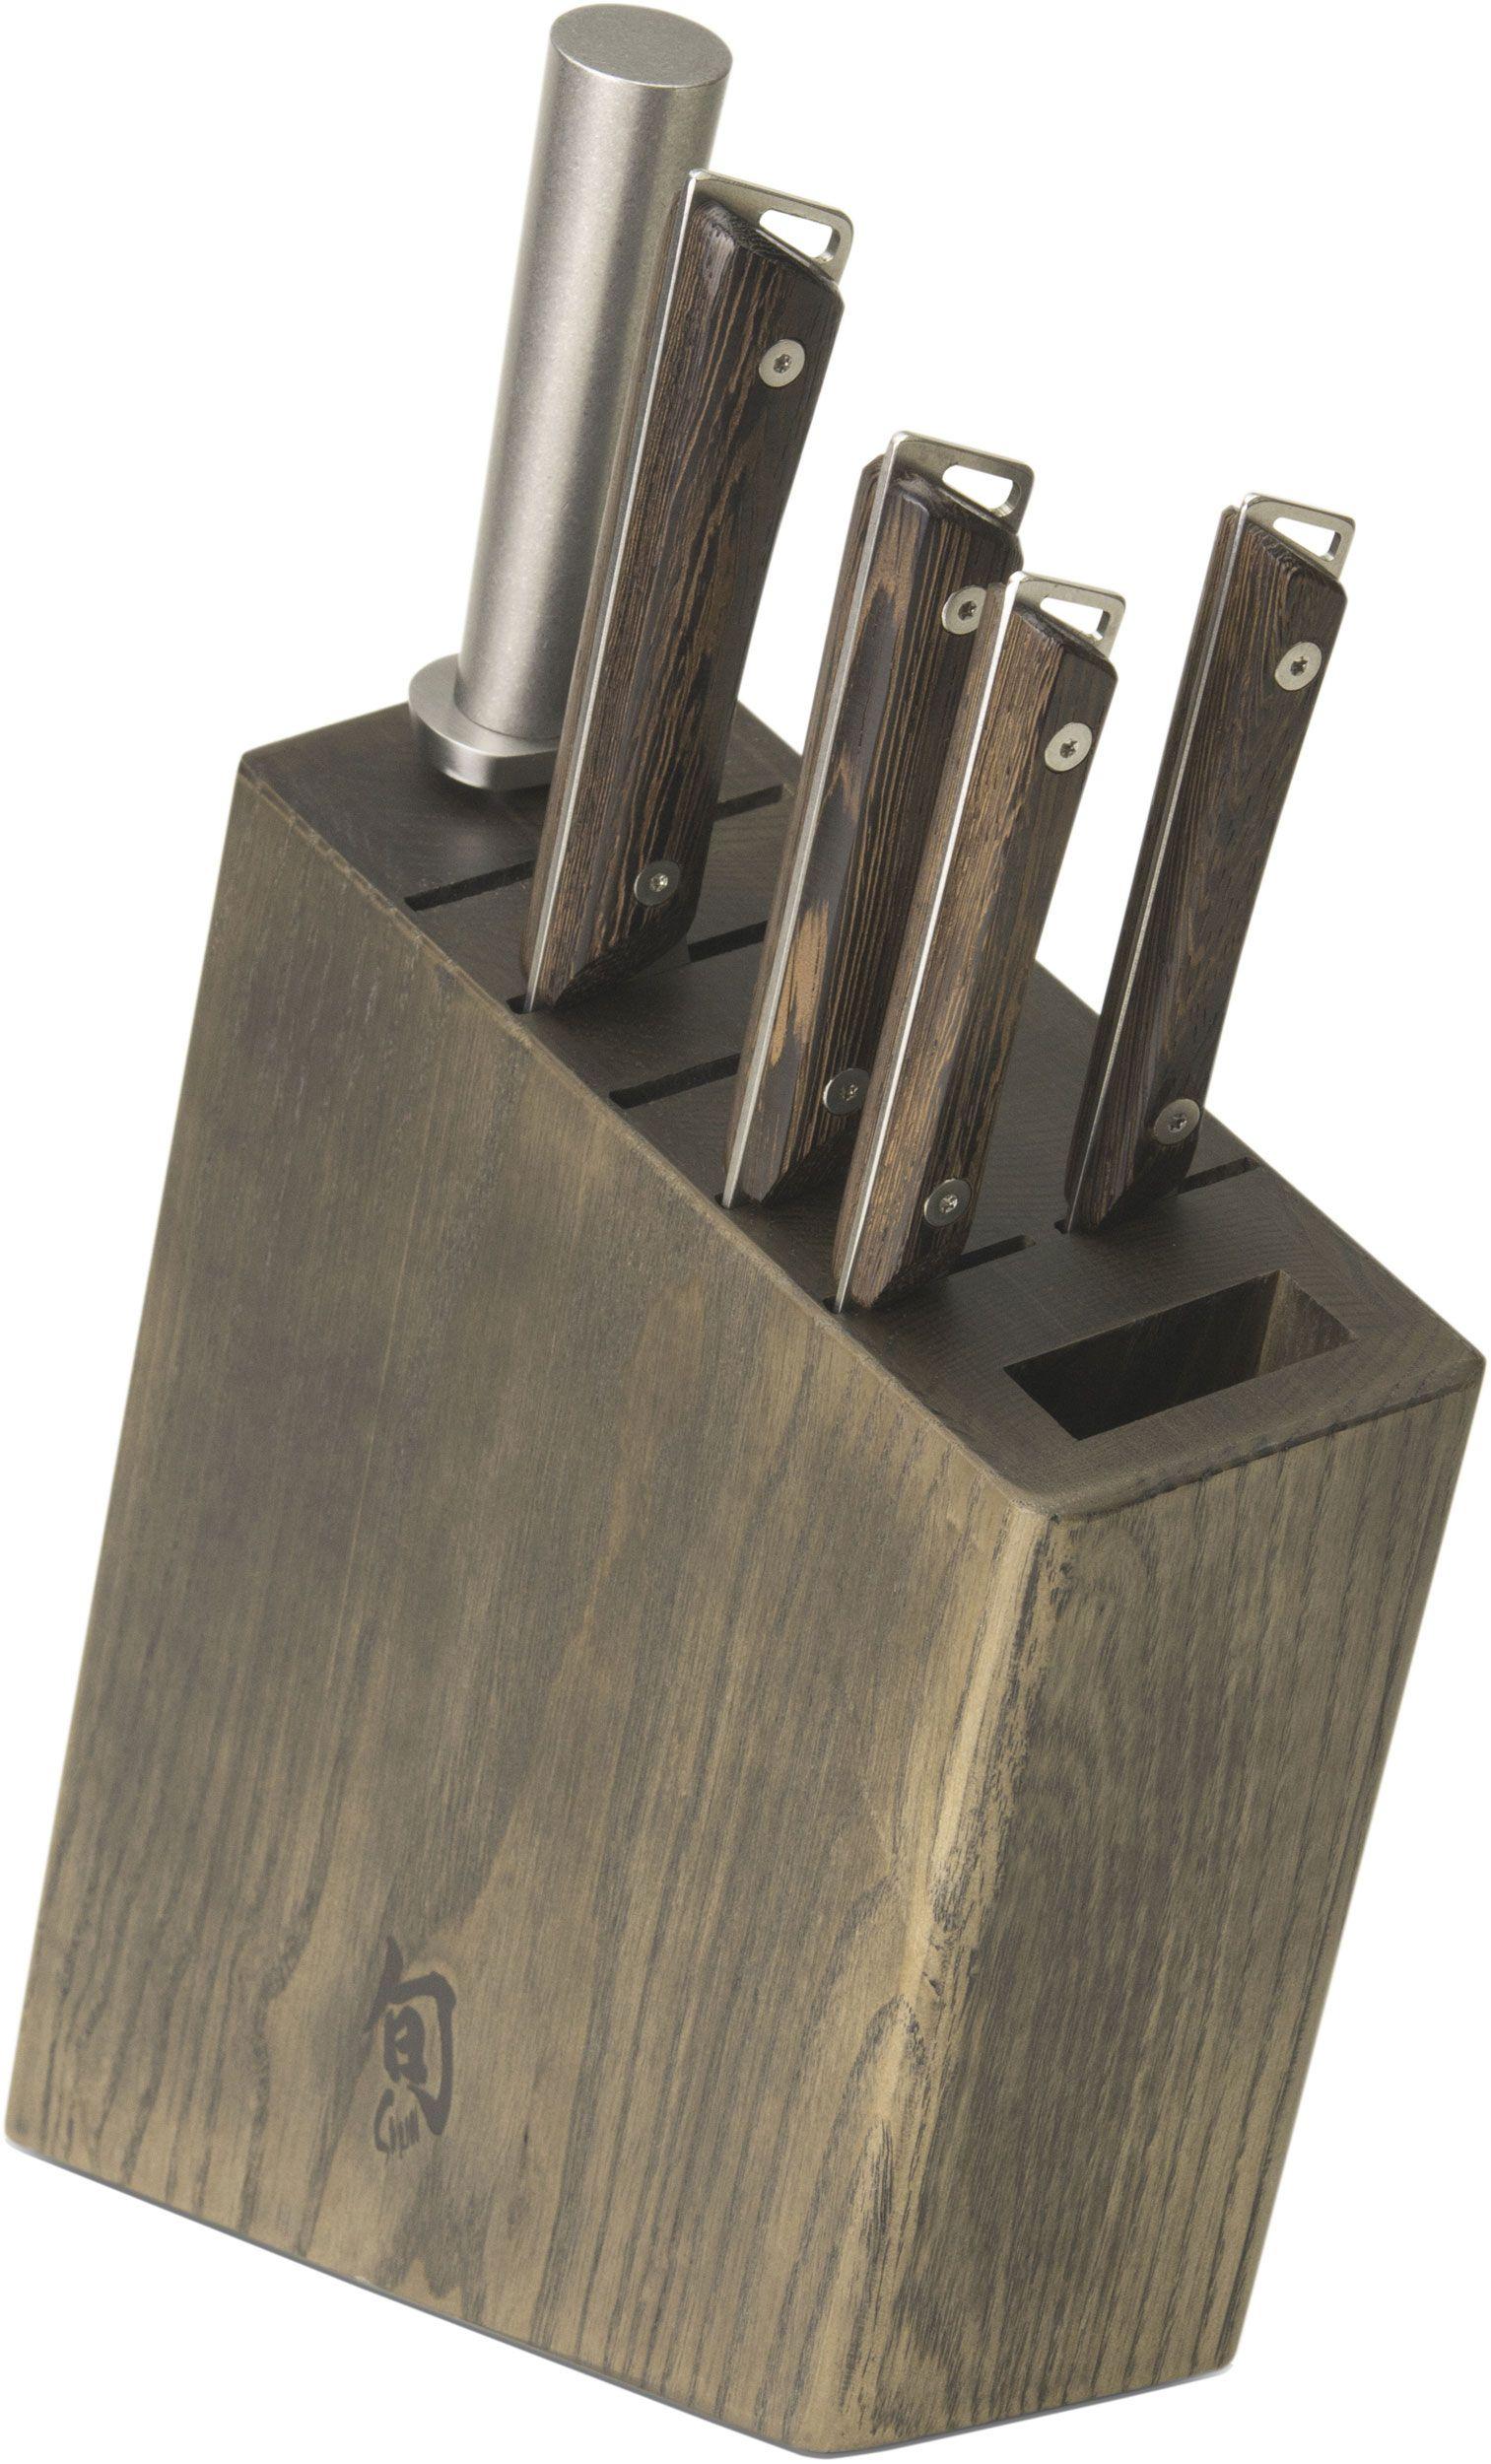 Shun SWTS0600 Kanso 6 Piece Block Set, Tagayasan Wood Handles